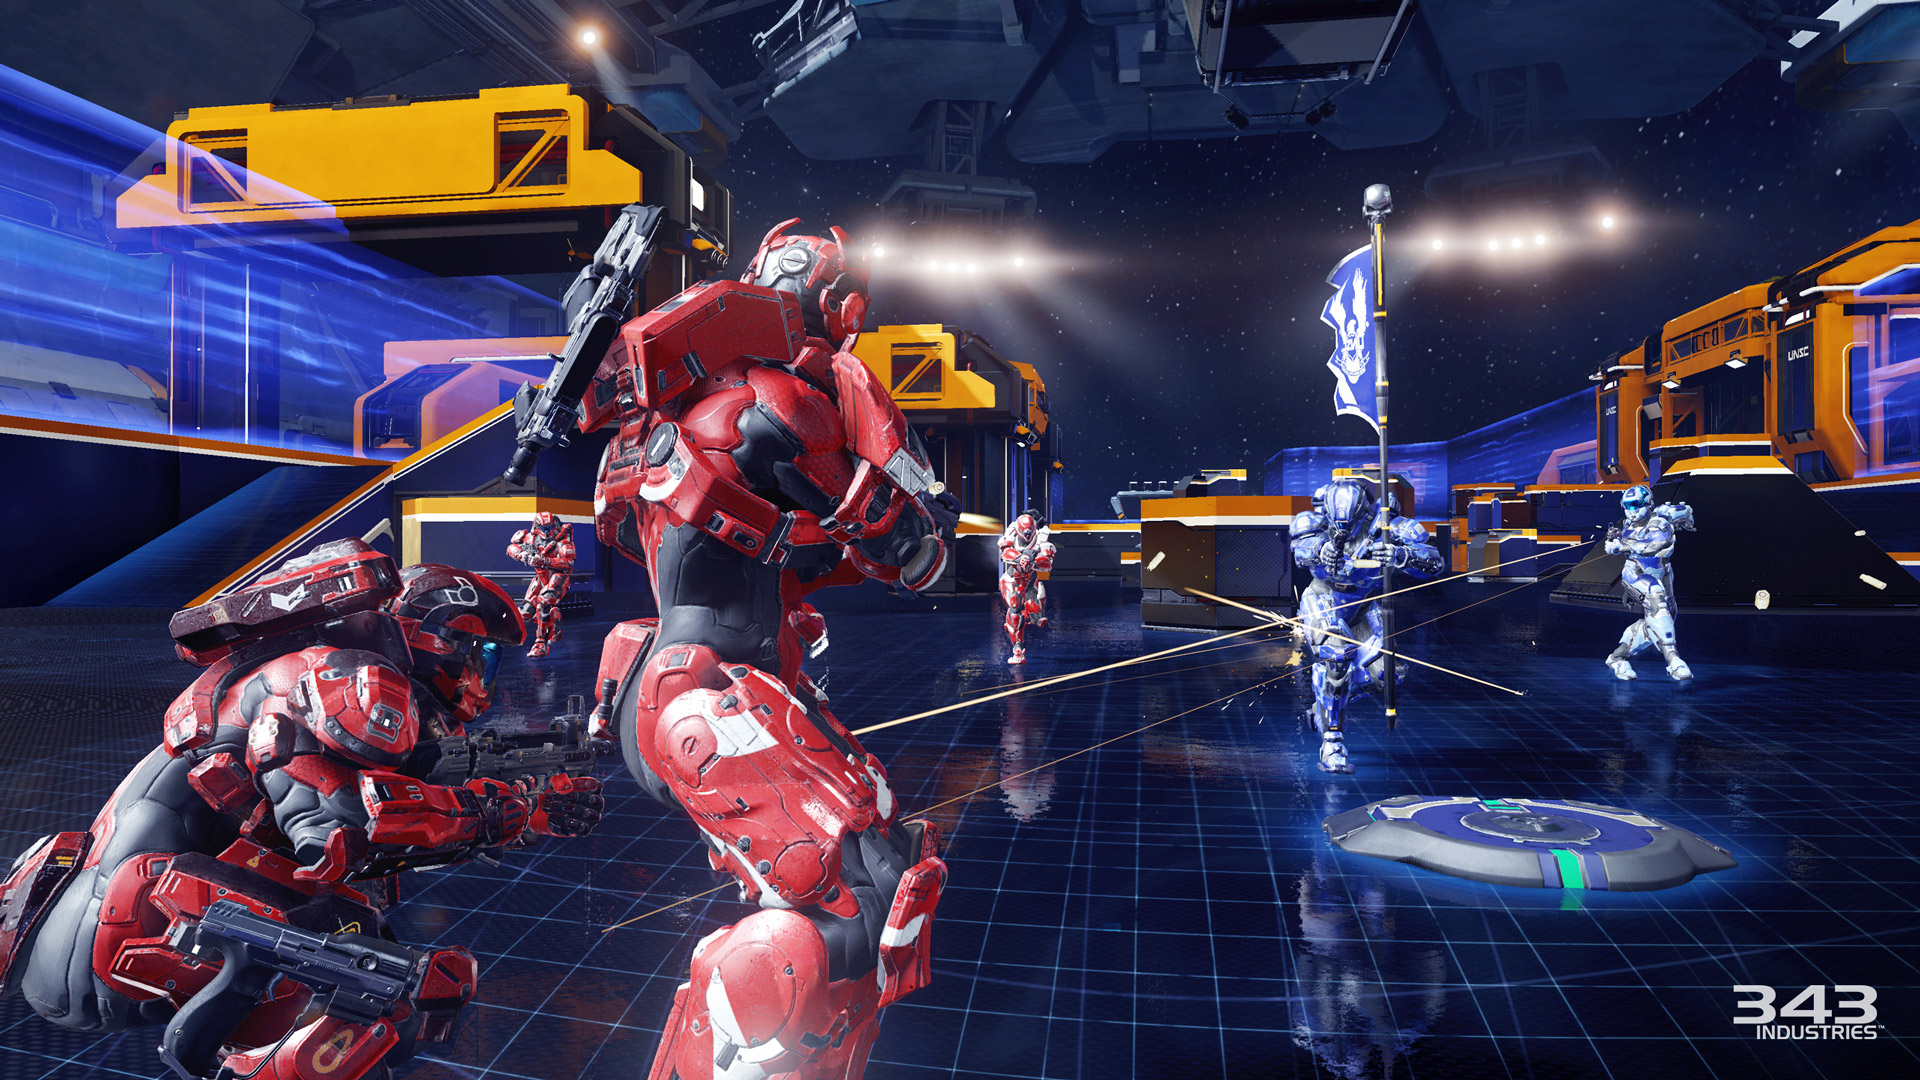 Halo 5 Guardians Arena